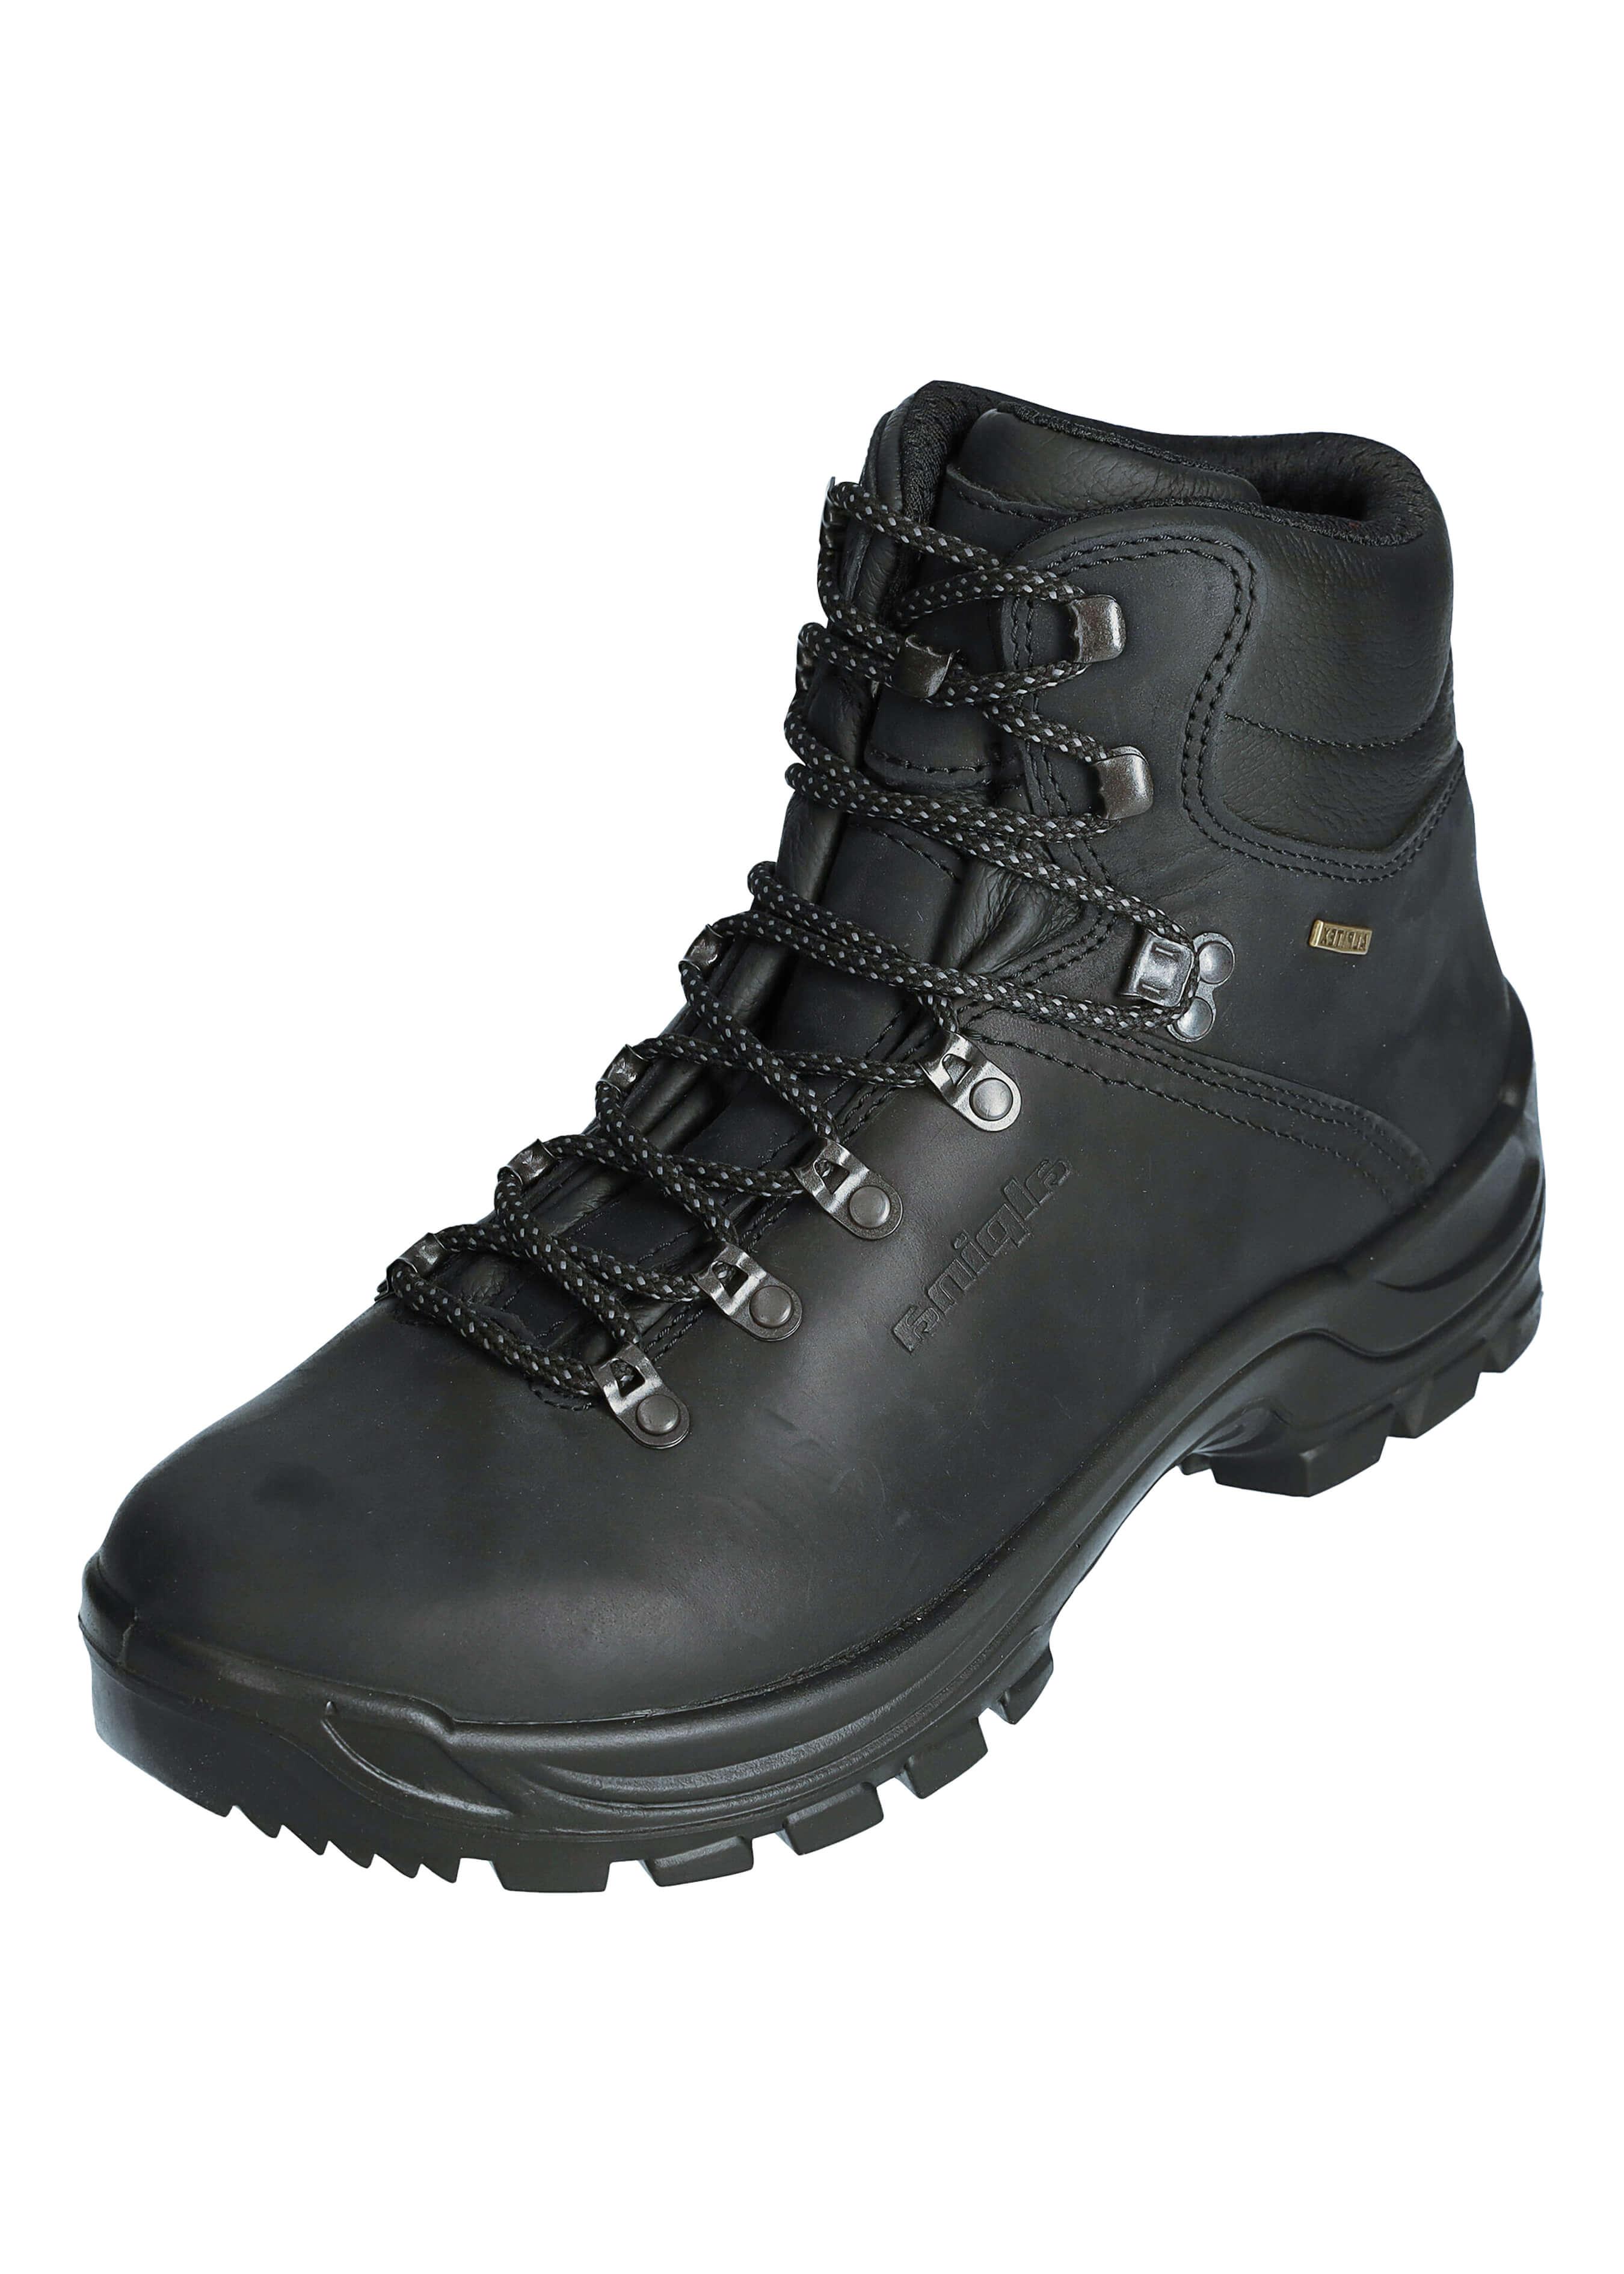 Chaussure de travail polyvalente Tundra 42781010 1